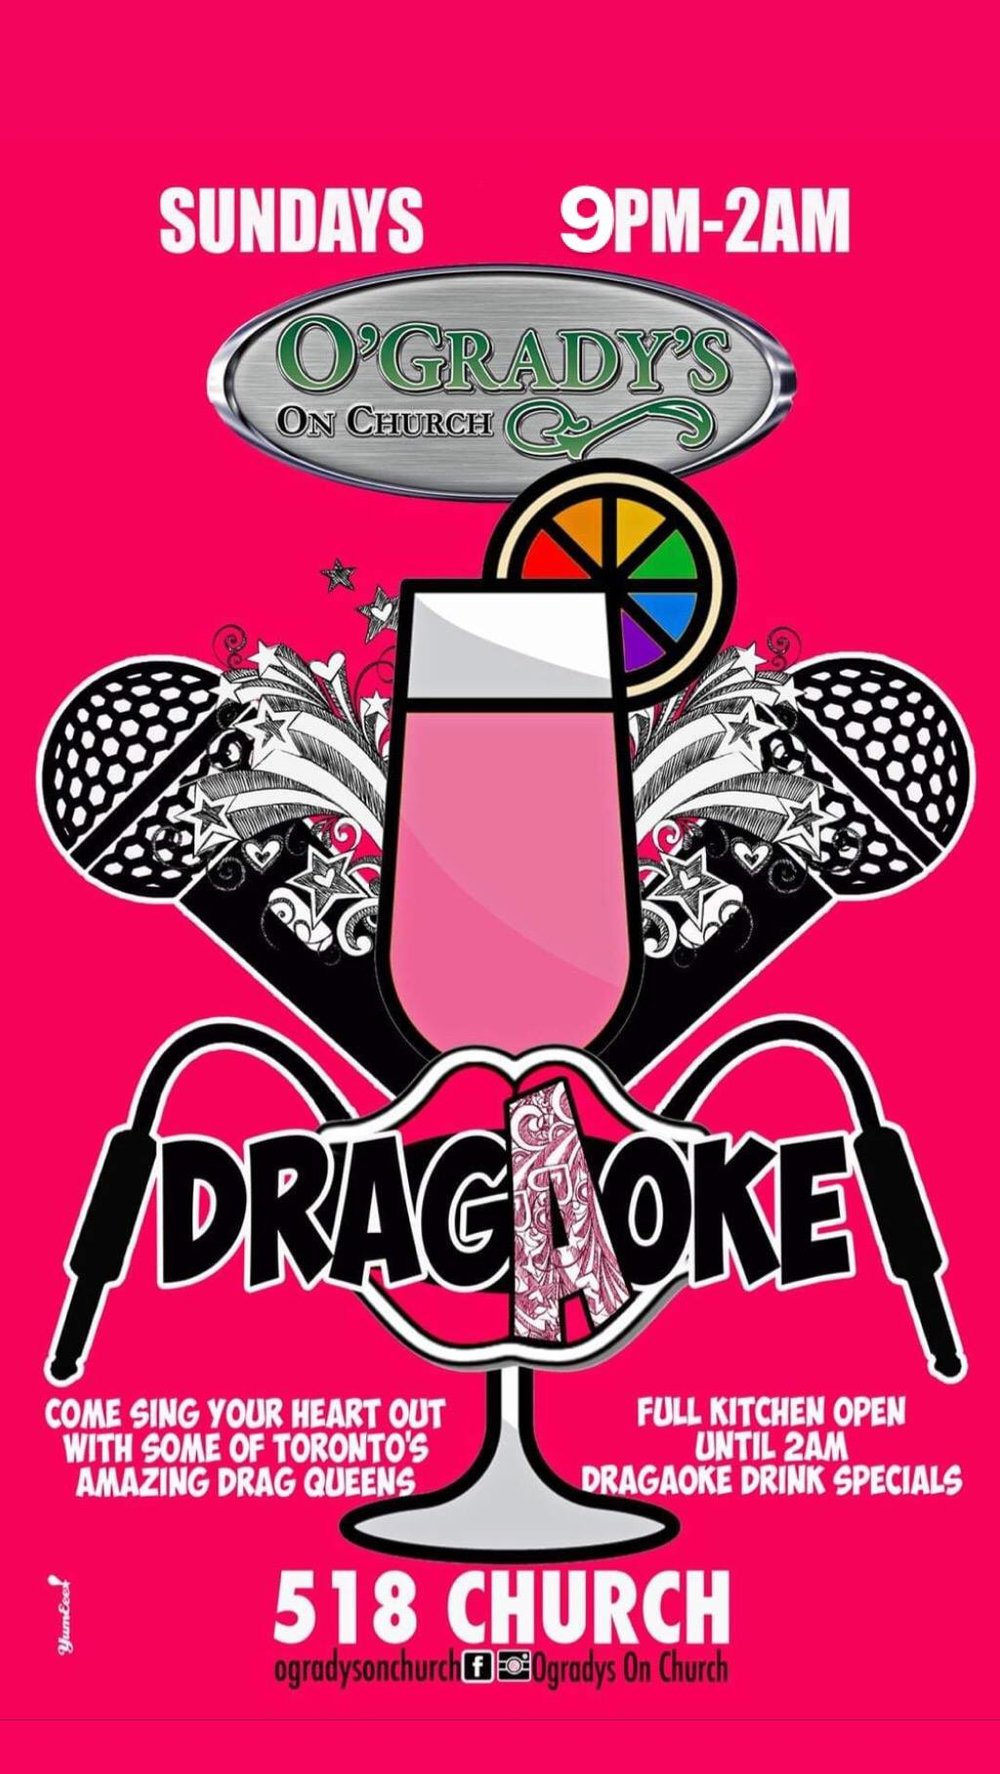 Drag-A-Oke-Sundays-O'Gradys